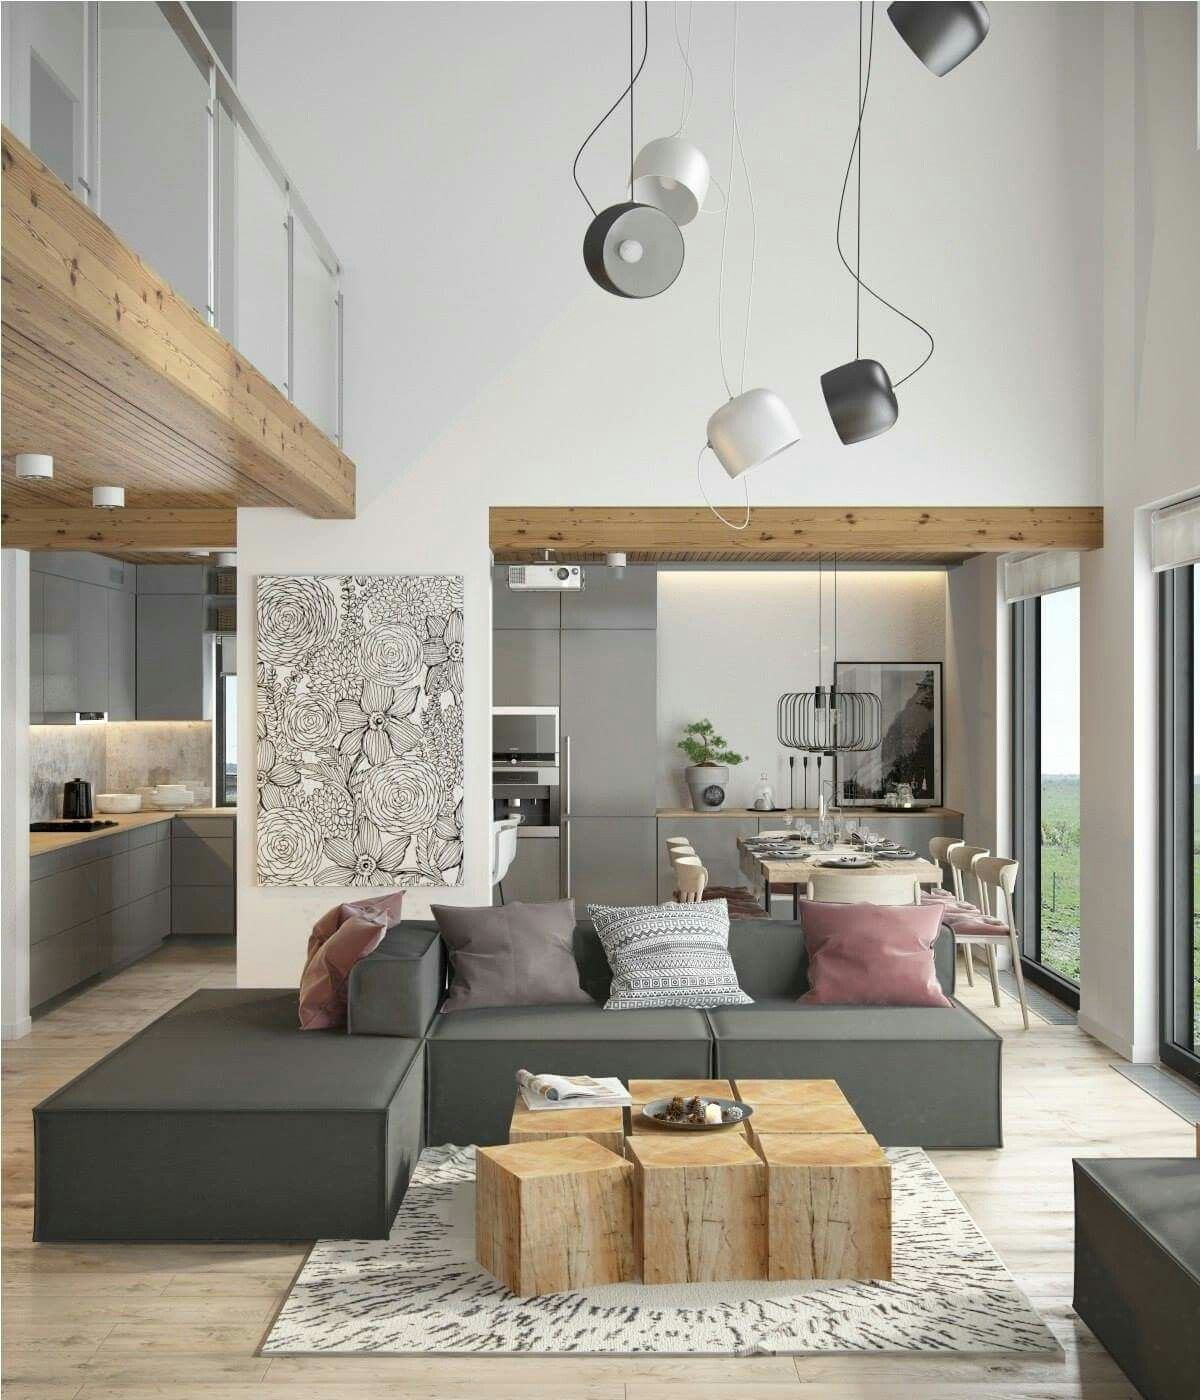 Hermosa sala | Casa en surubi\'í | Pinterest | Wohnzimmer, Sims Haus ...